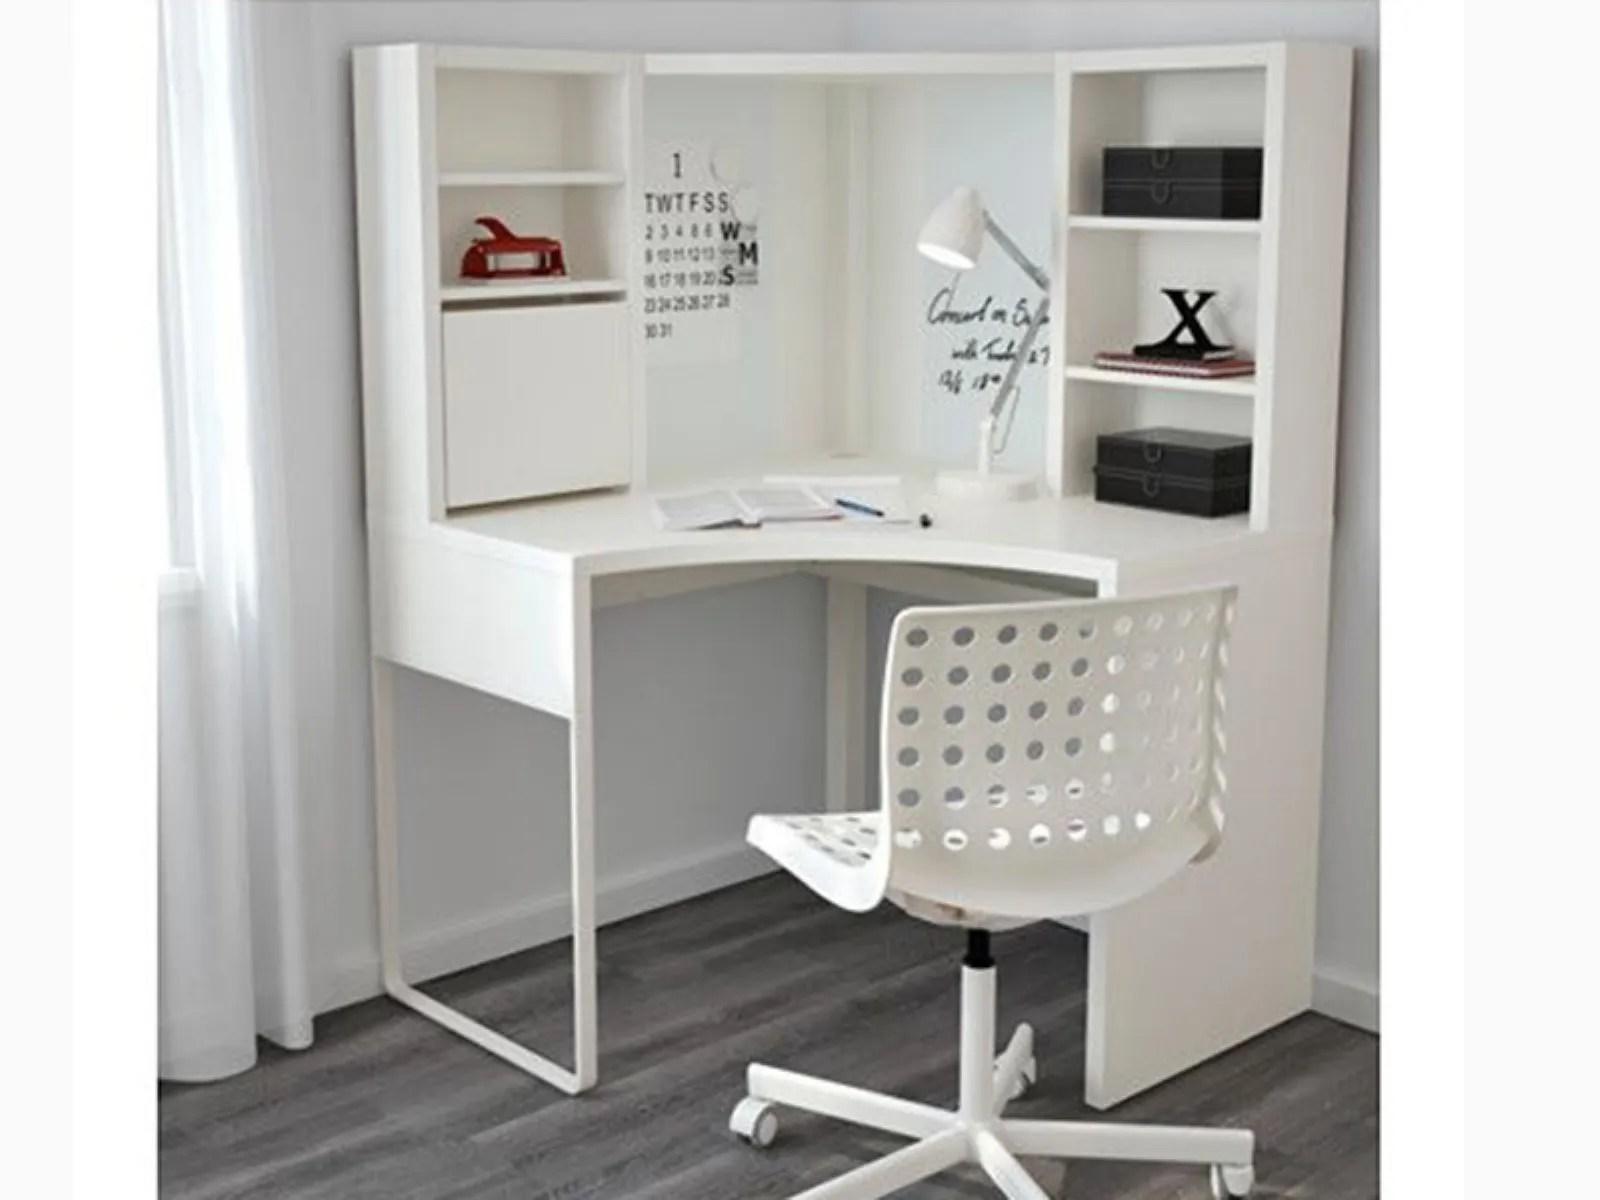 Scrivania Ikea funzionalit accessibile  Tavoli